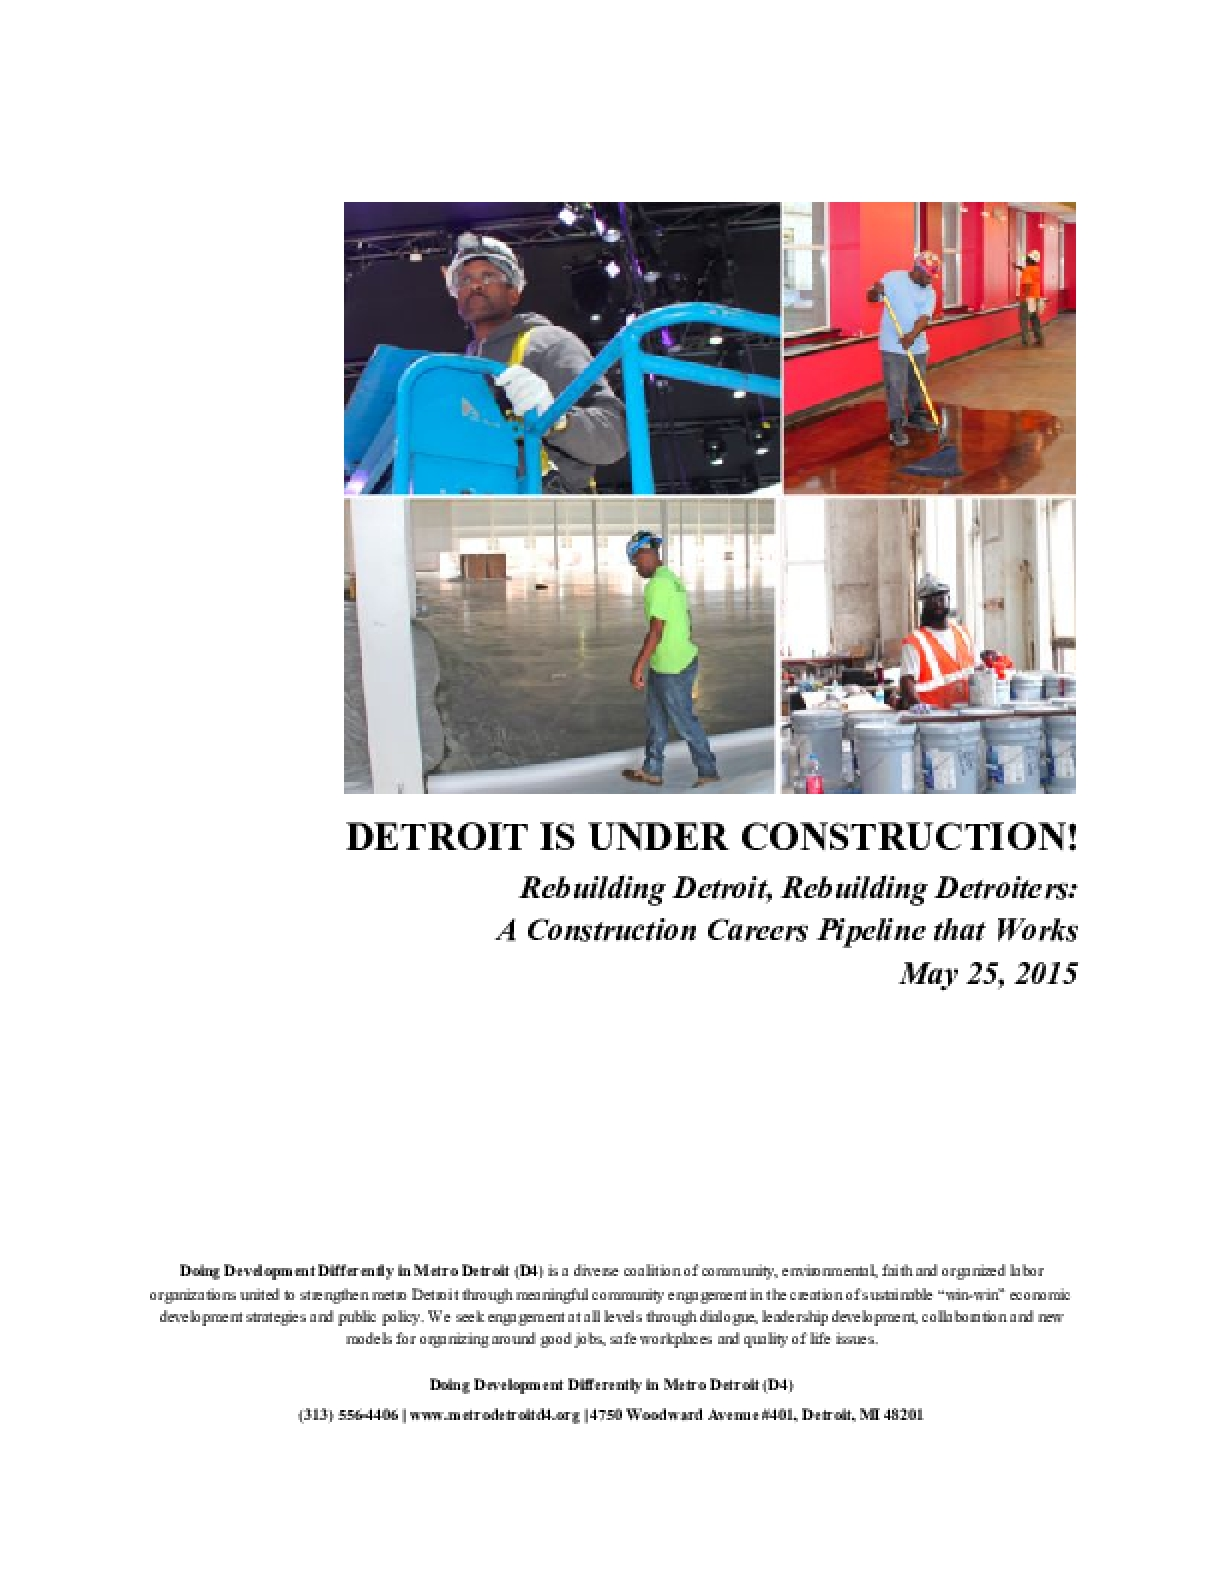 Detroit is Under Construction: Rebuilding Detroit, Rebuilding Detroiters, A Construction Careers Pipeline that Works